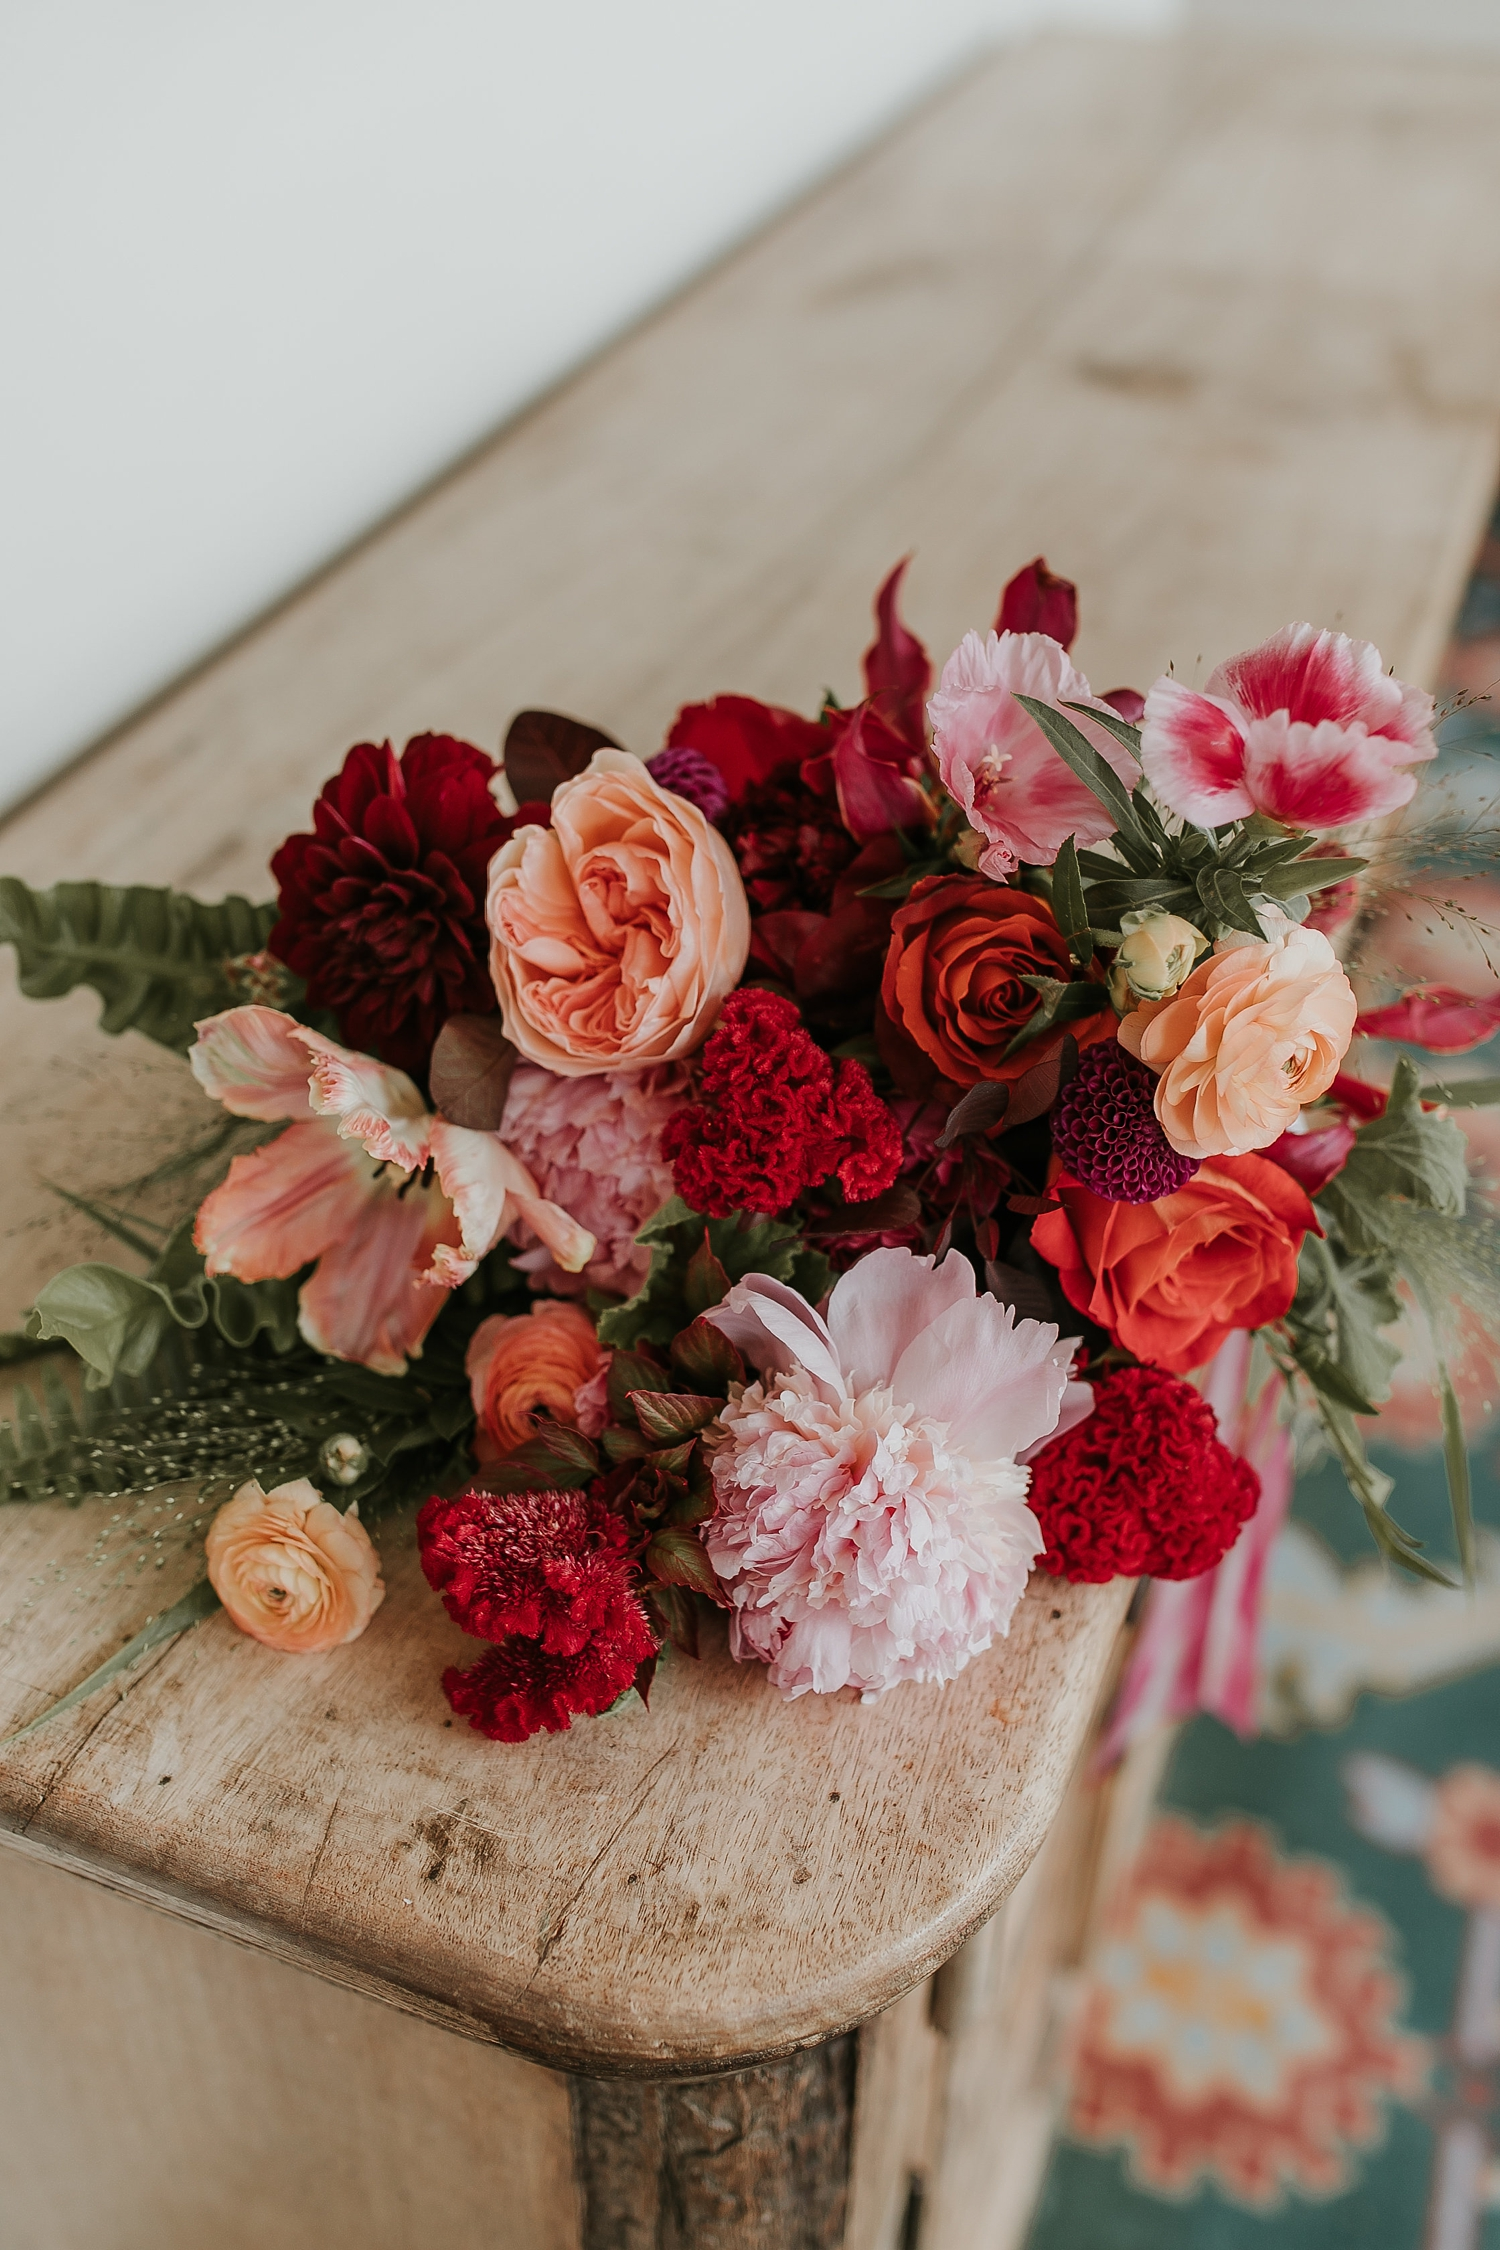 Alicia+lucia+photography+-+albuquerque+wedding+photographer+-+santa+fe+wedding+photography+-+new+mexico+wedding+photographer+-+wedding+flowers+-+summer+wedding+flowers_0031.jpg